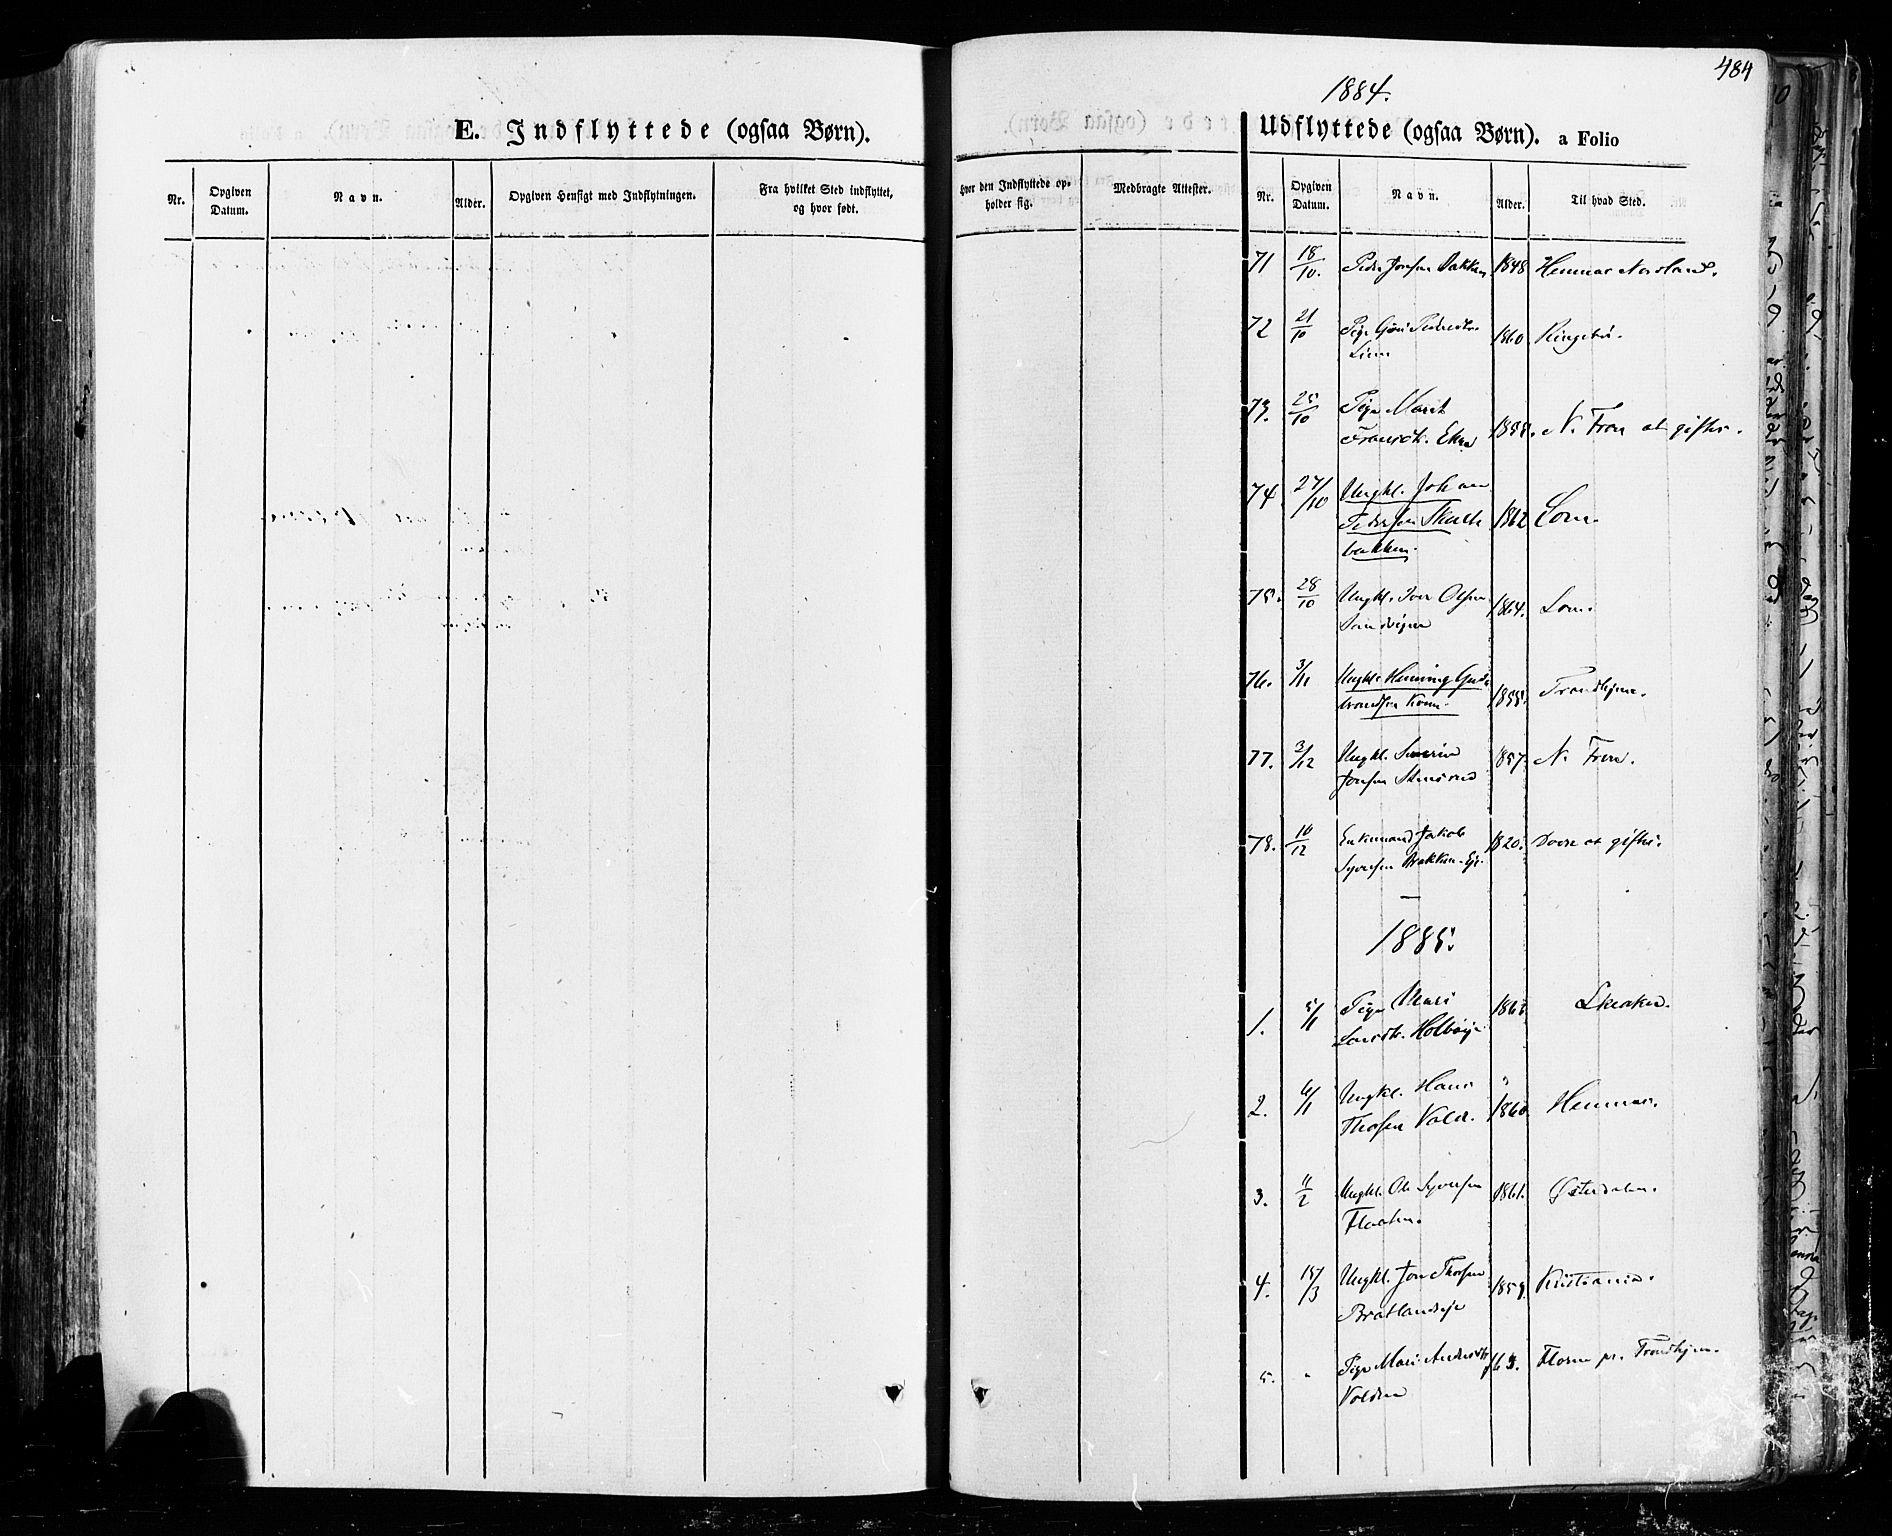 SAH, Vågå prestekontor, Ministerialbok nr. 7 /1, 1872-1886, s. 484